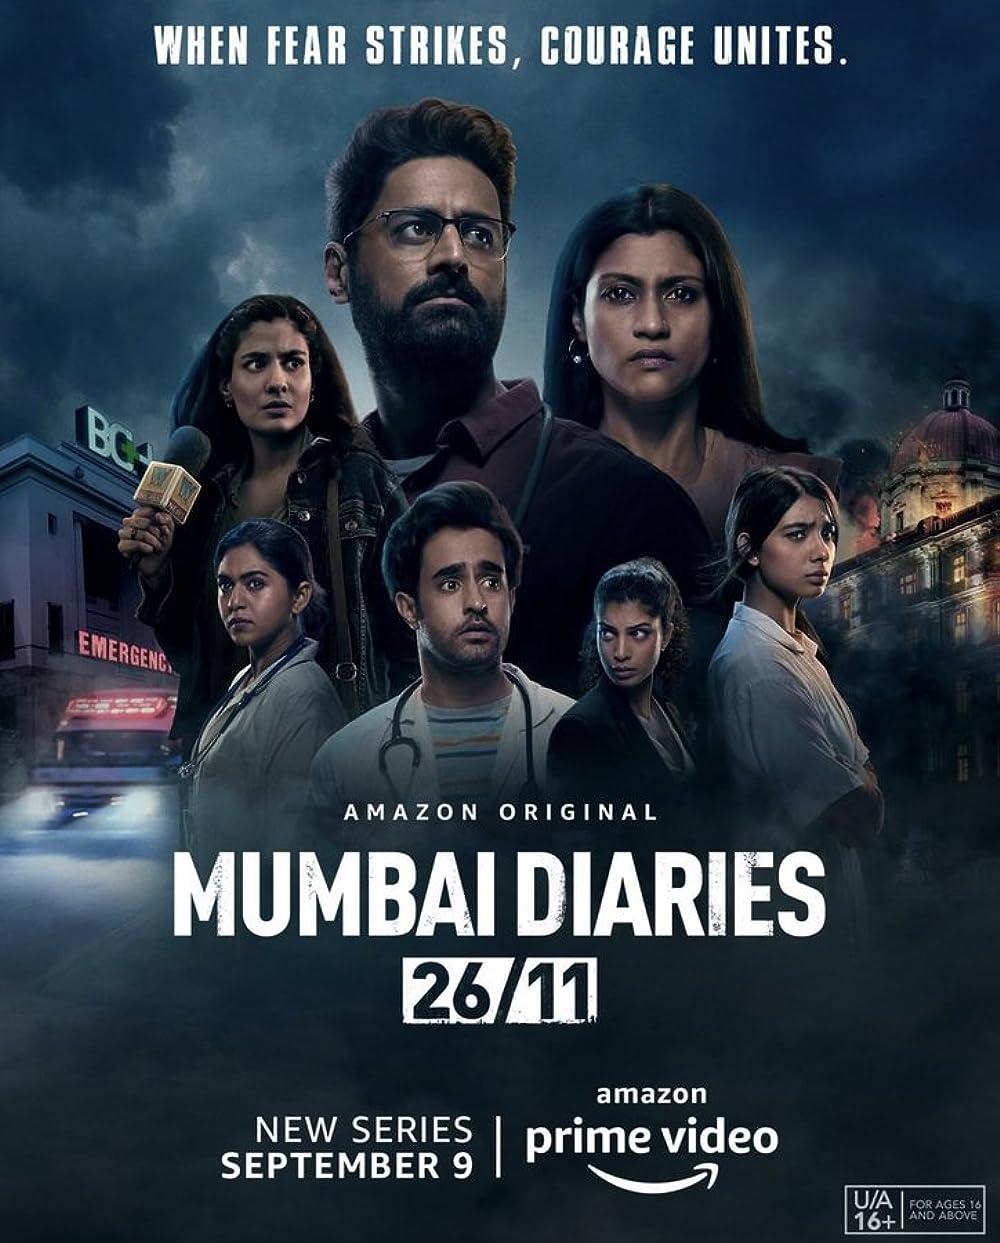 Mumbai Diaries 2611 2021 S01 Complete Hindi Web Series 480p WEB-DL 1GB